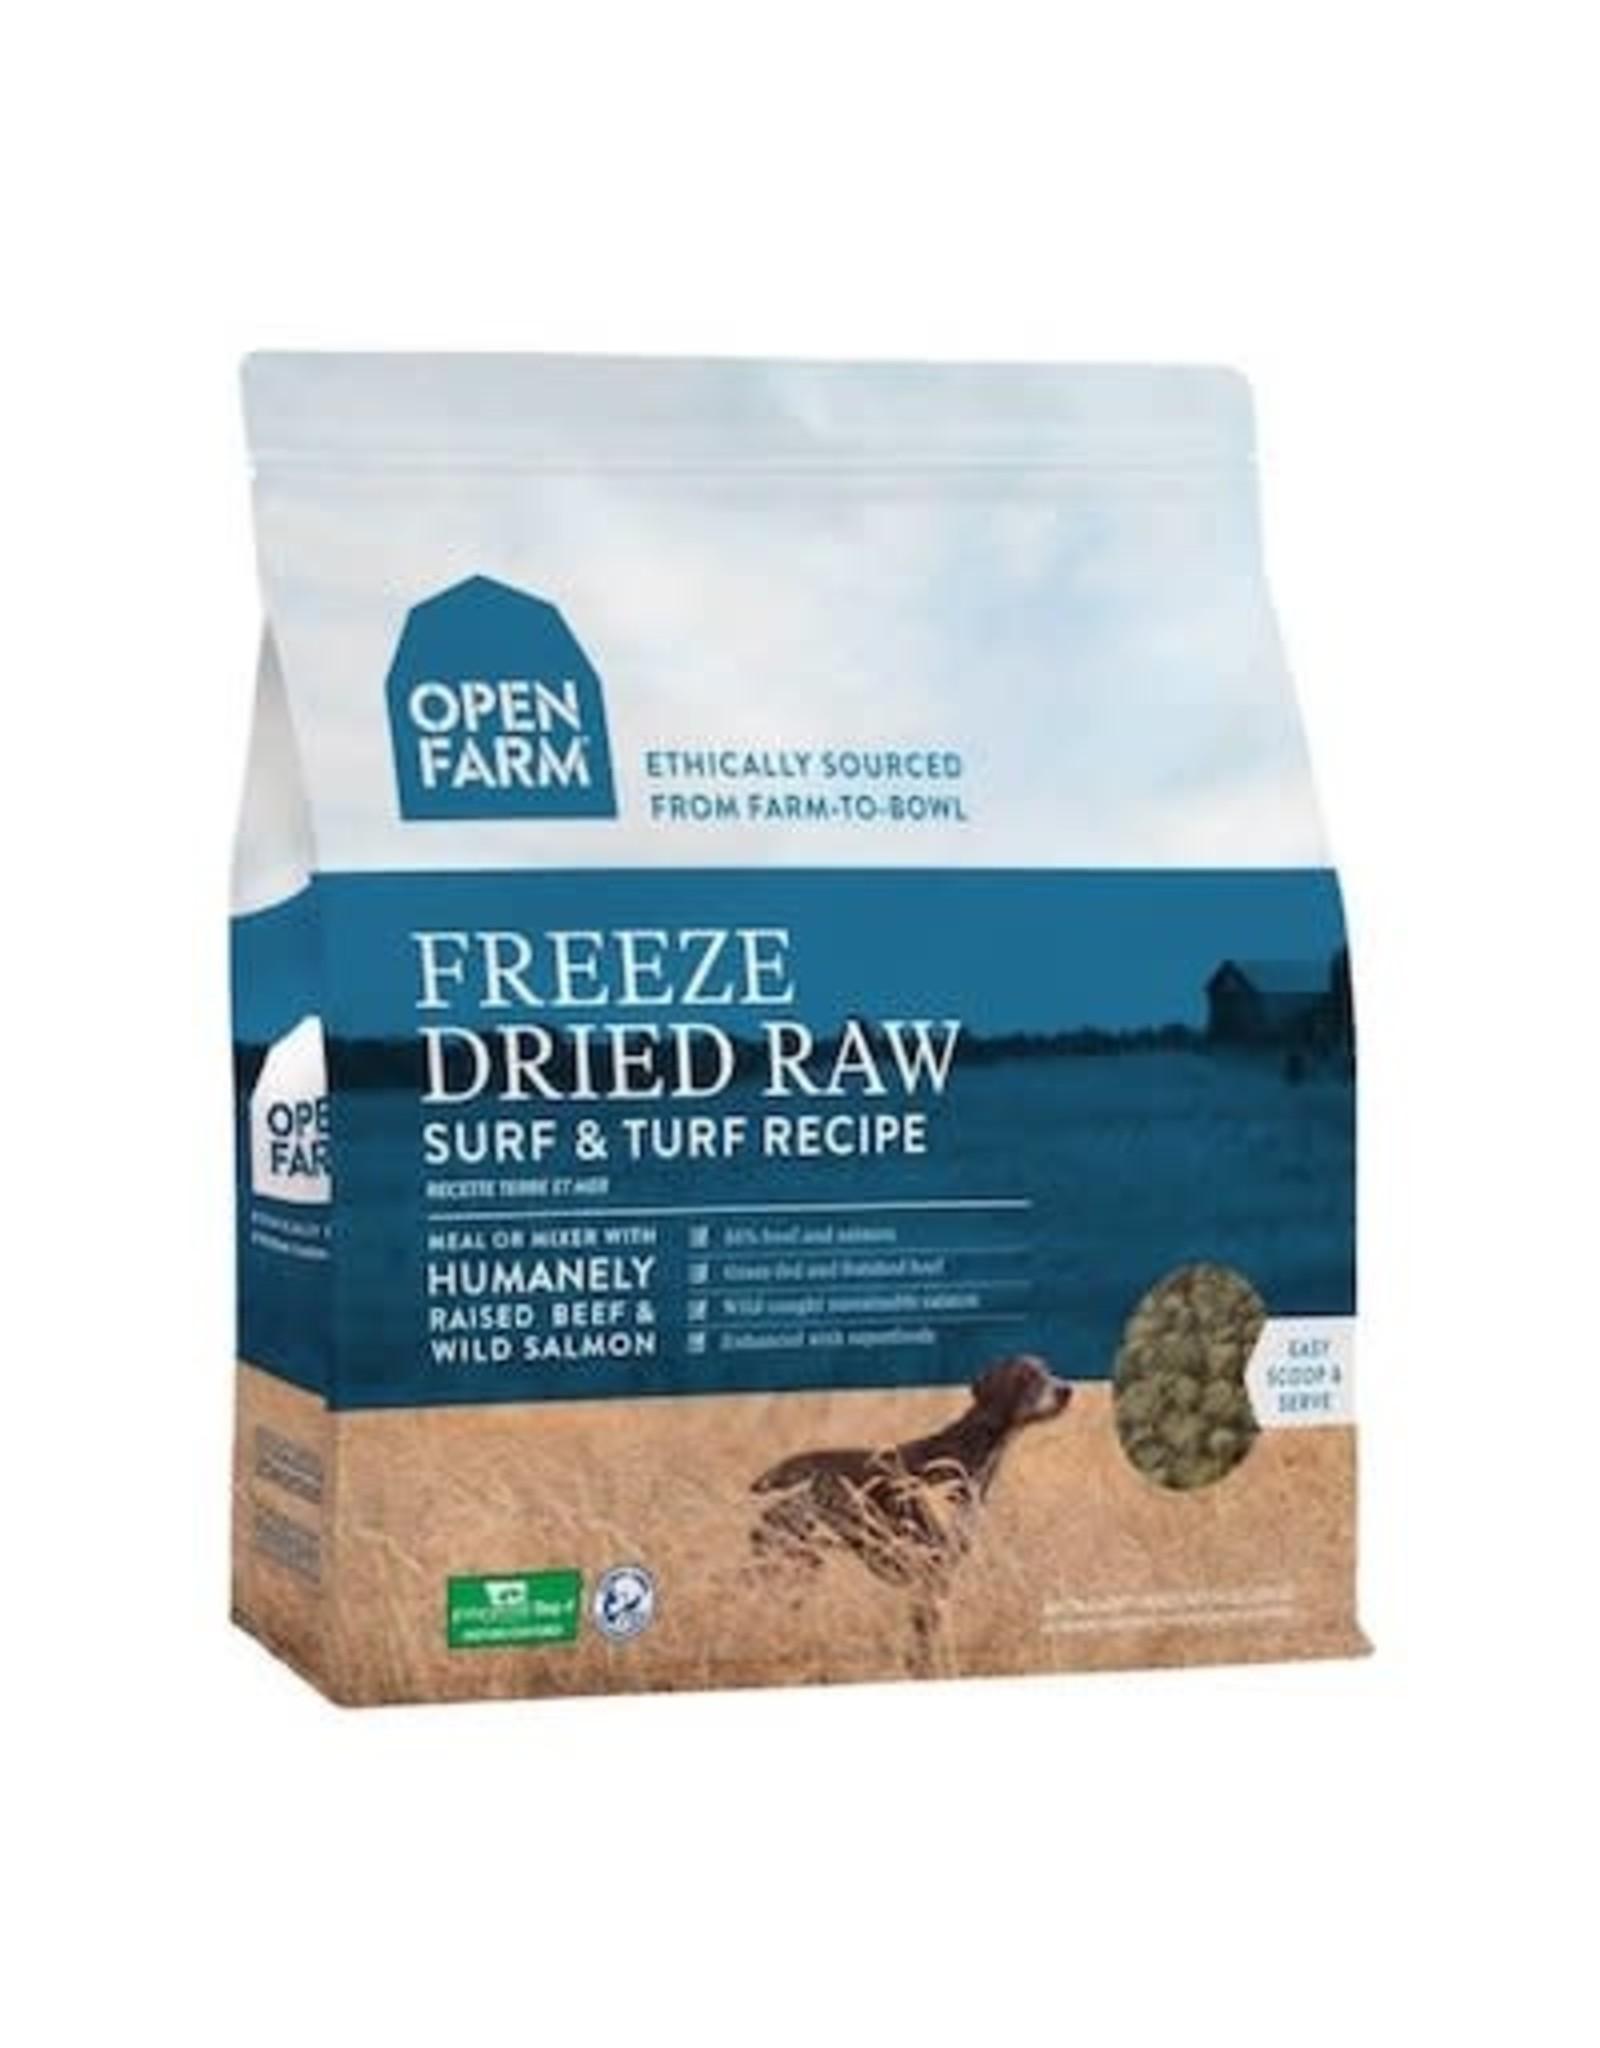 Open Farm OPEN FARM DOG FREEZE DRIED RAW SURF & TURF RECIPE